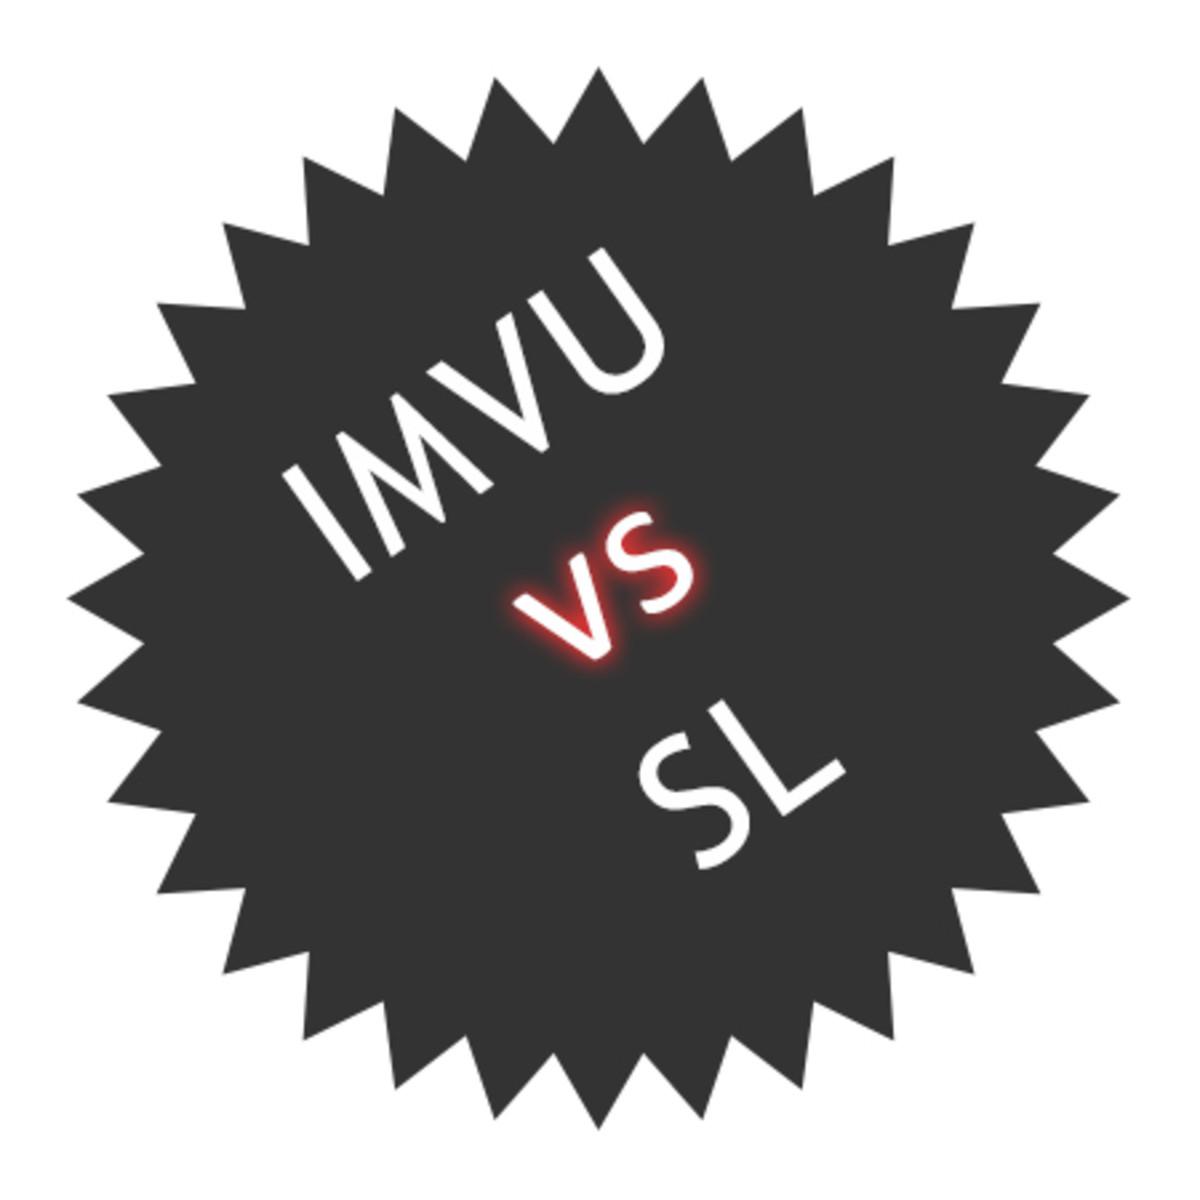 imvu-vs-second-life